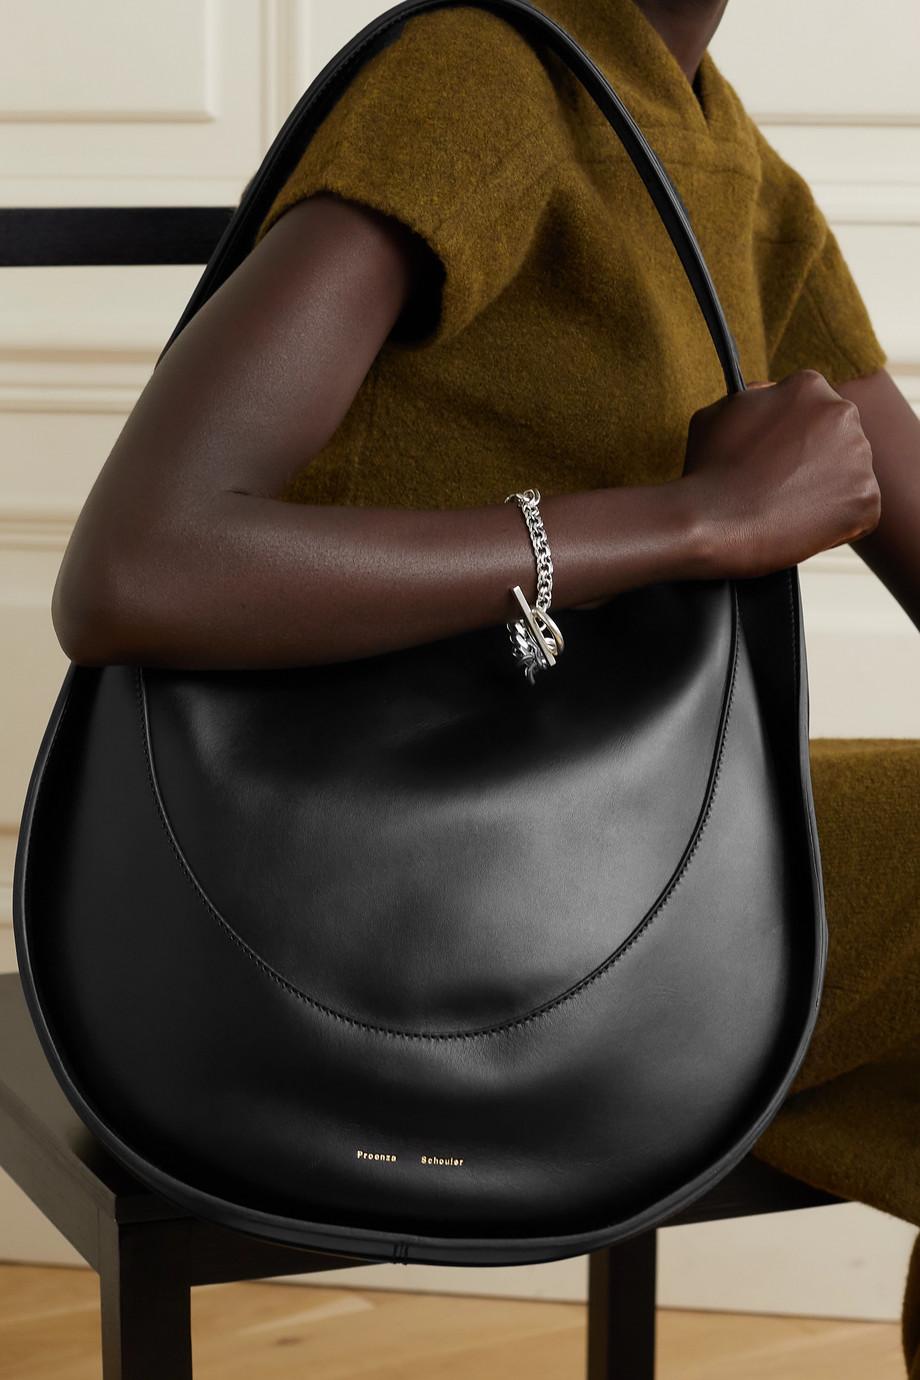 Proenza Schouler Arch large leather shoulder bag